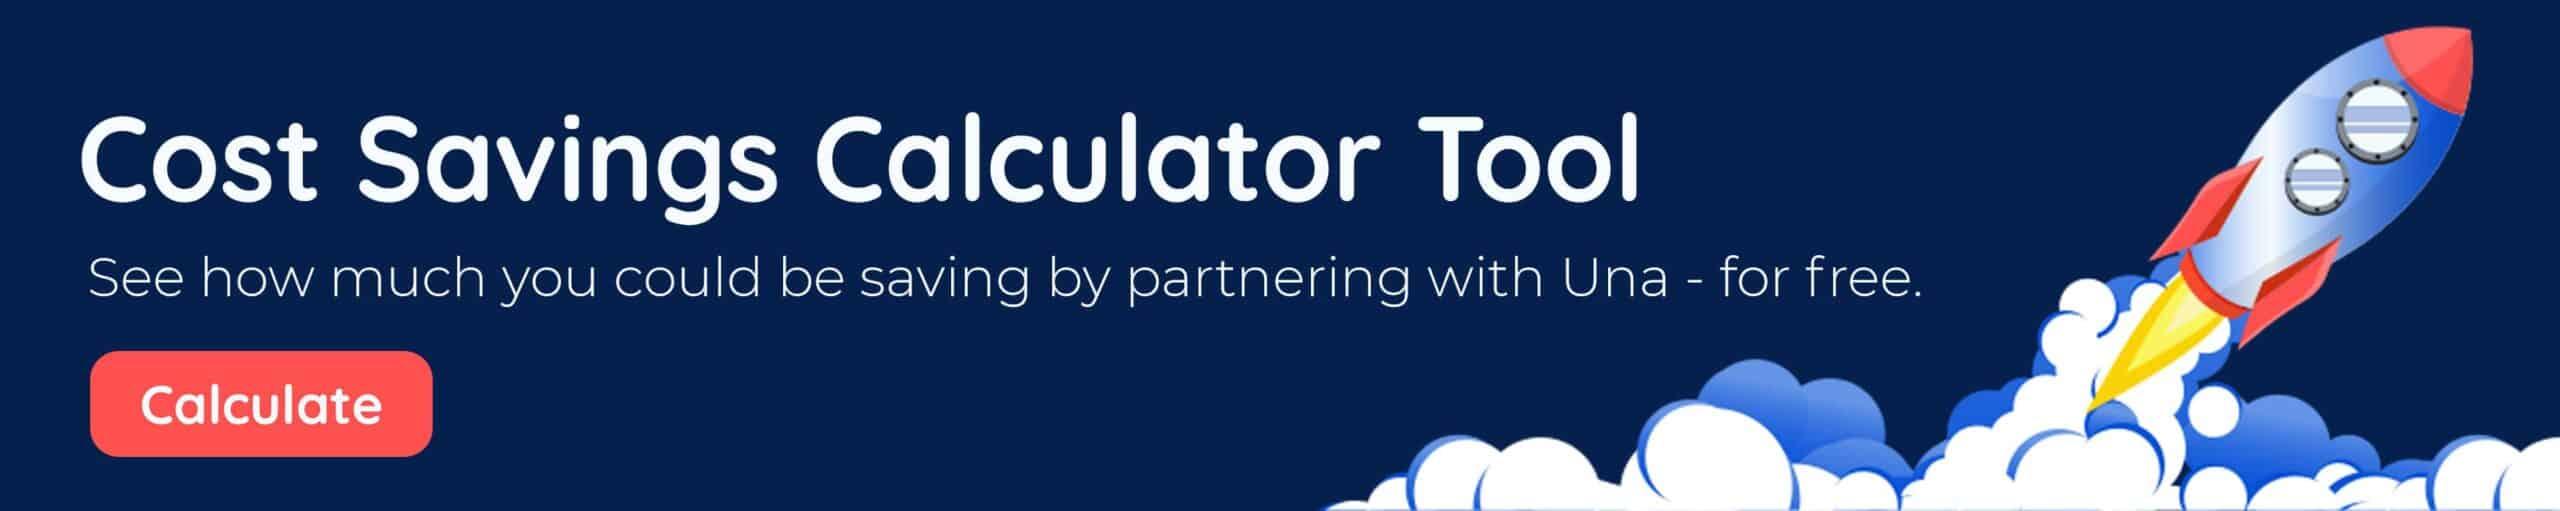 cost savings calculator tool